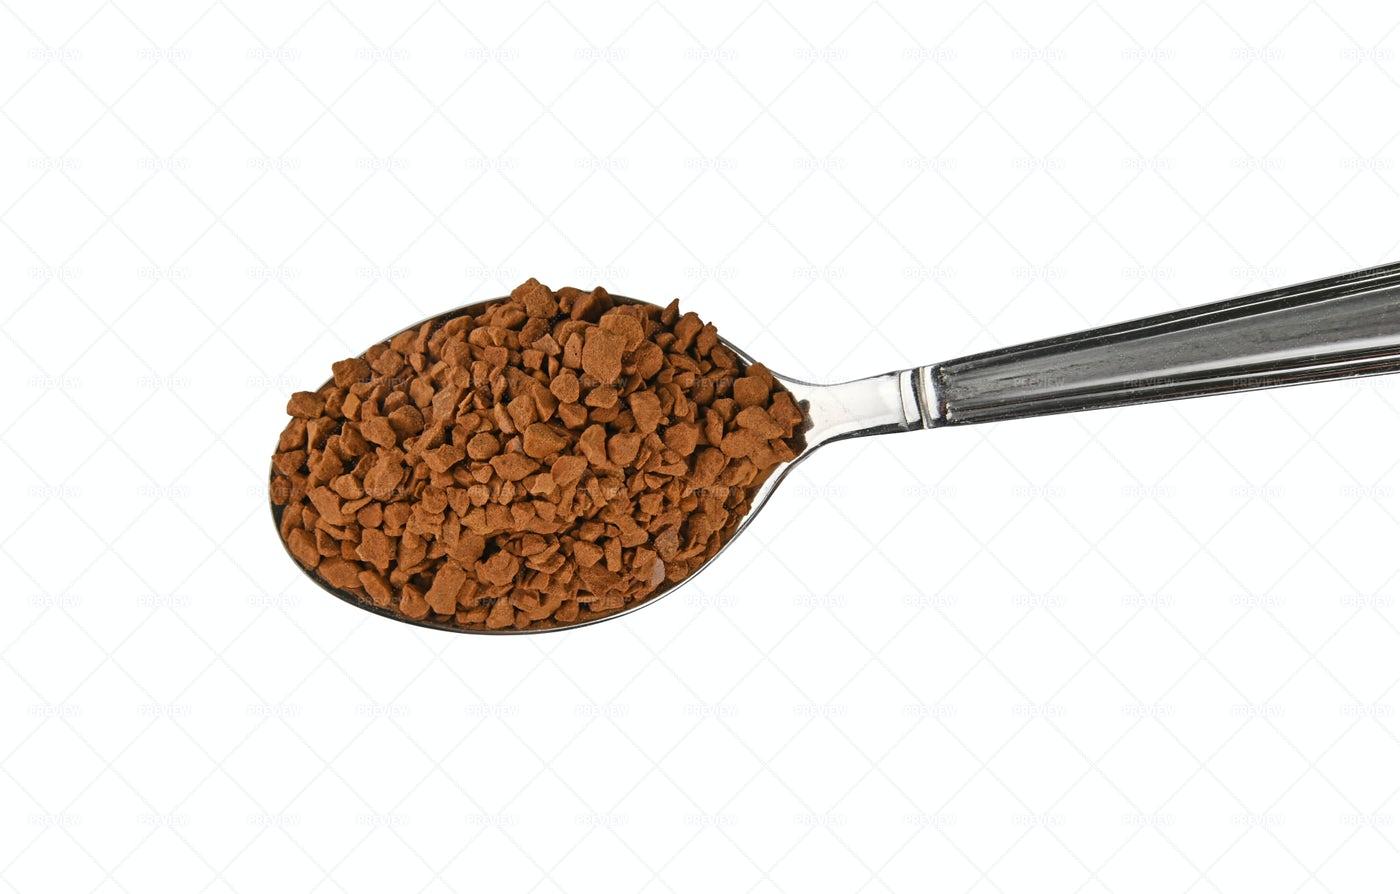 Spoon Of Instant Coffee: Stock Photos